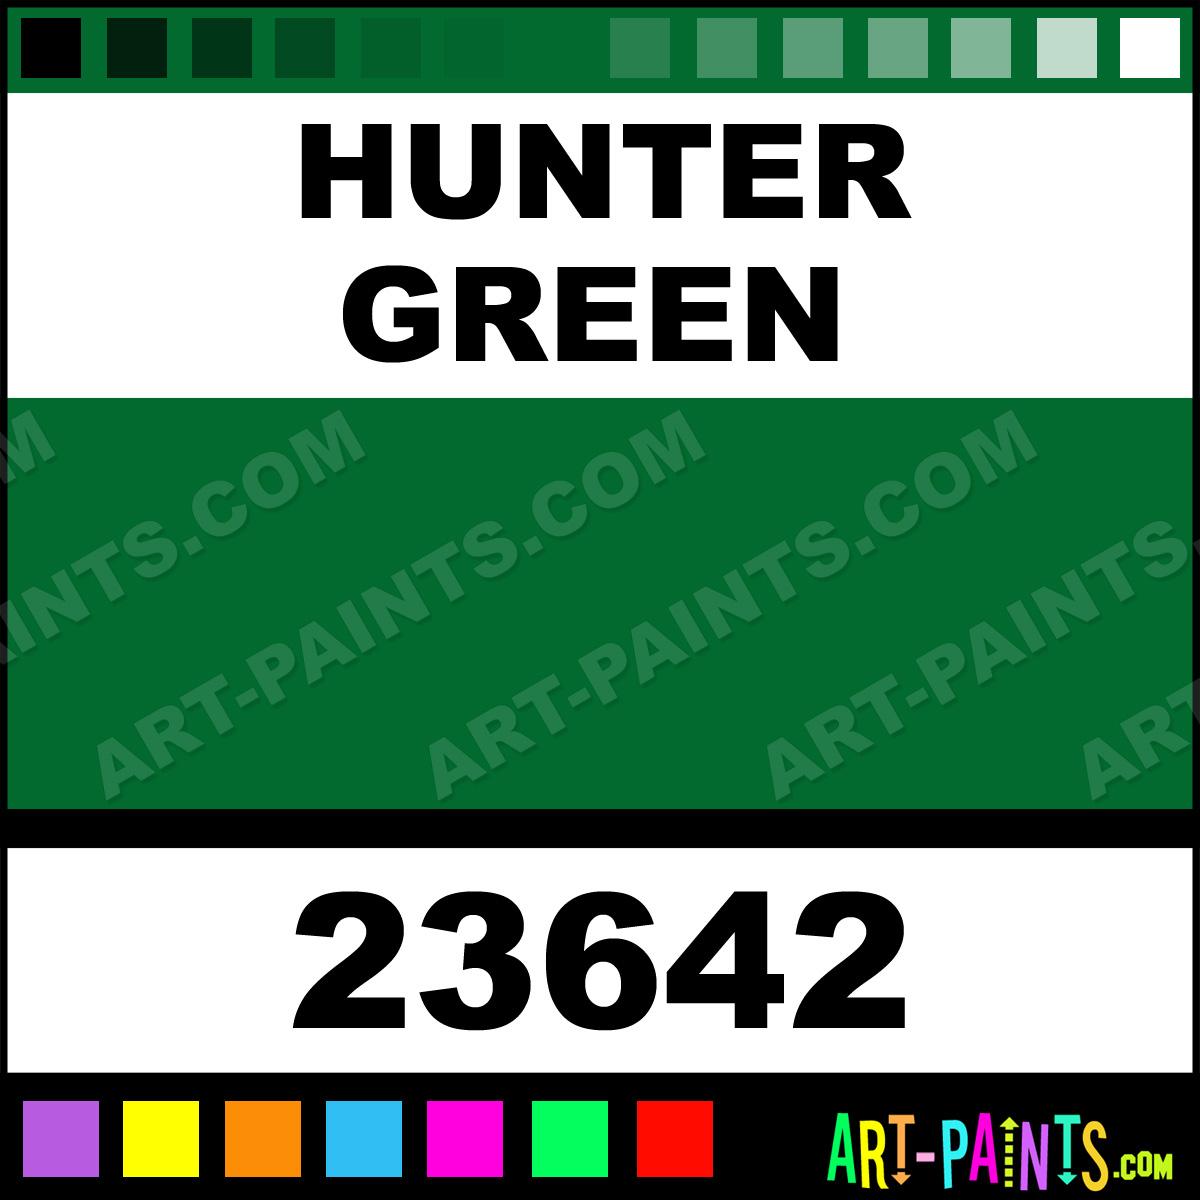 Hunter Green Artist Acrylic Paints - 23642 - Hunter Green Paint ...